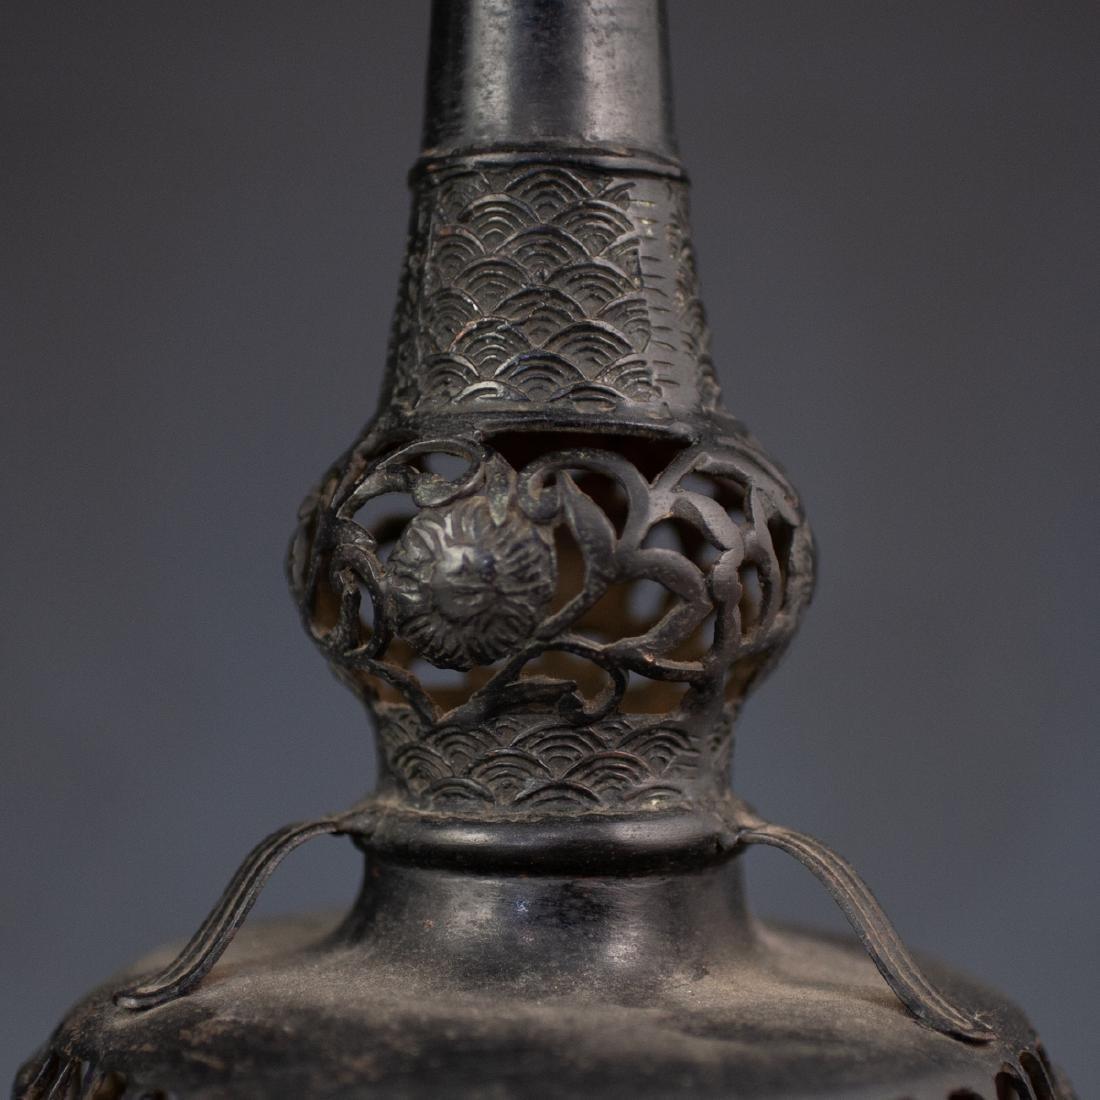 Japanese Bronze Altar Candlesticks - 3